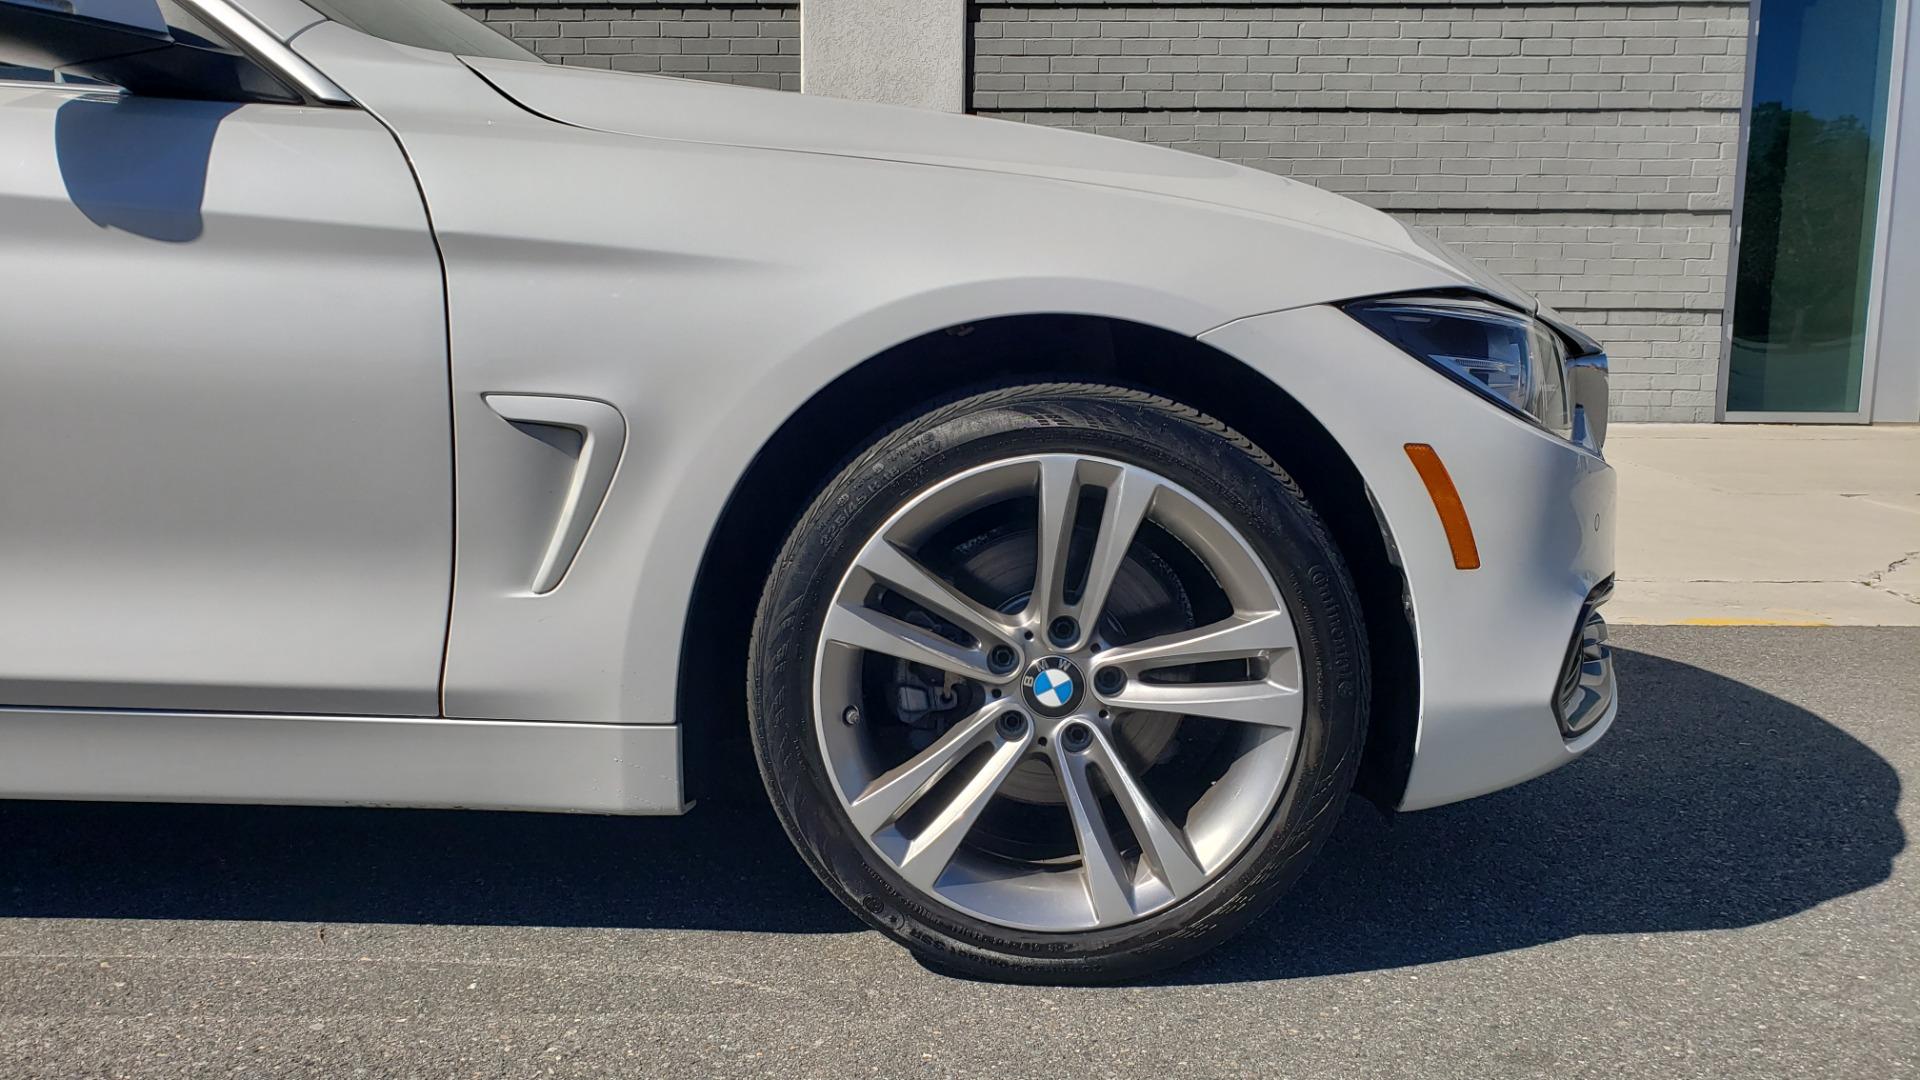 Used 2018 BMW 4 SERIES 430IXDRIVE / PREMIUM / NAV / SUNROOF / ESSENTIALS PKG for sale $28,995 at Formula Imports in Charlotte NC 28227 85